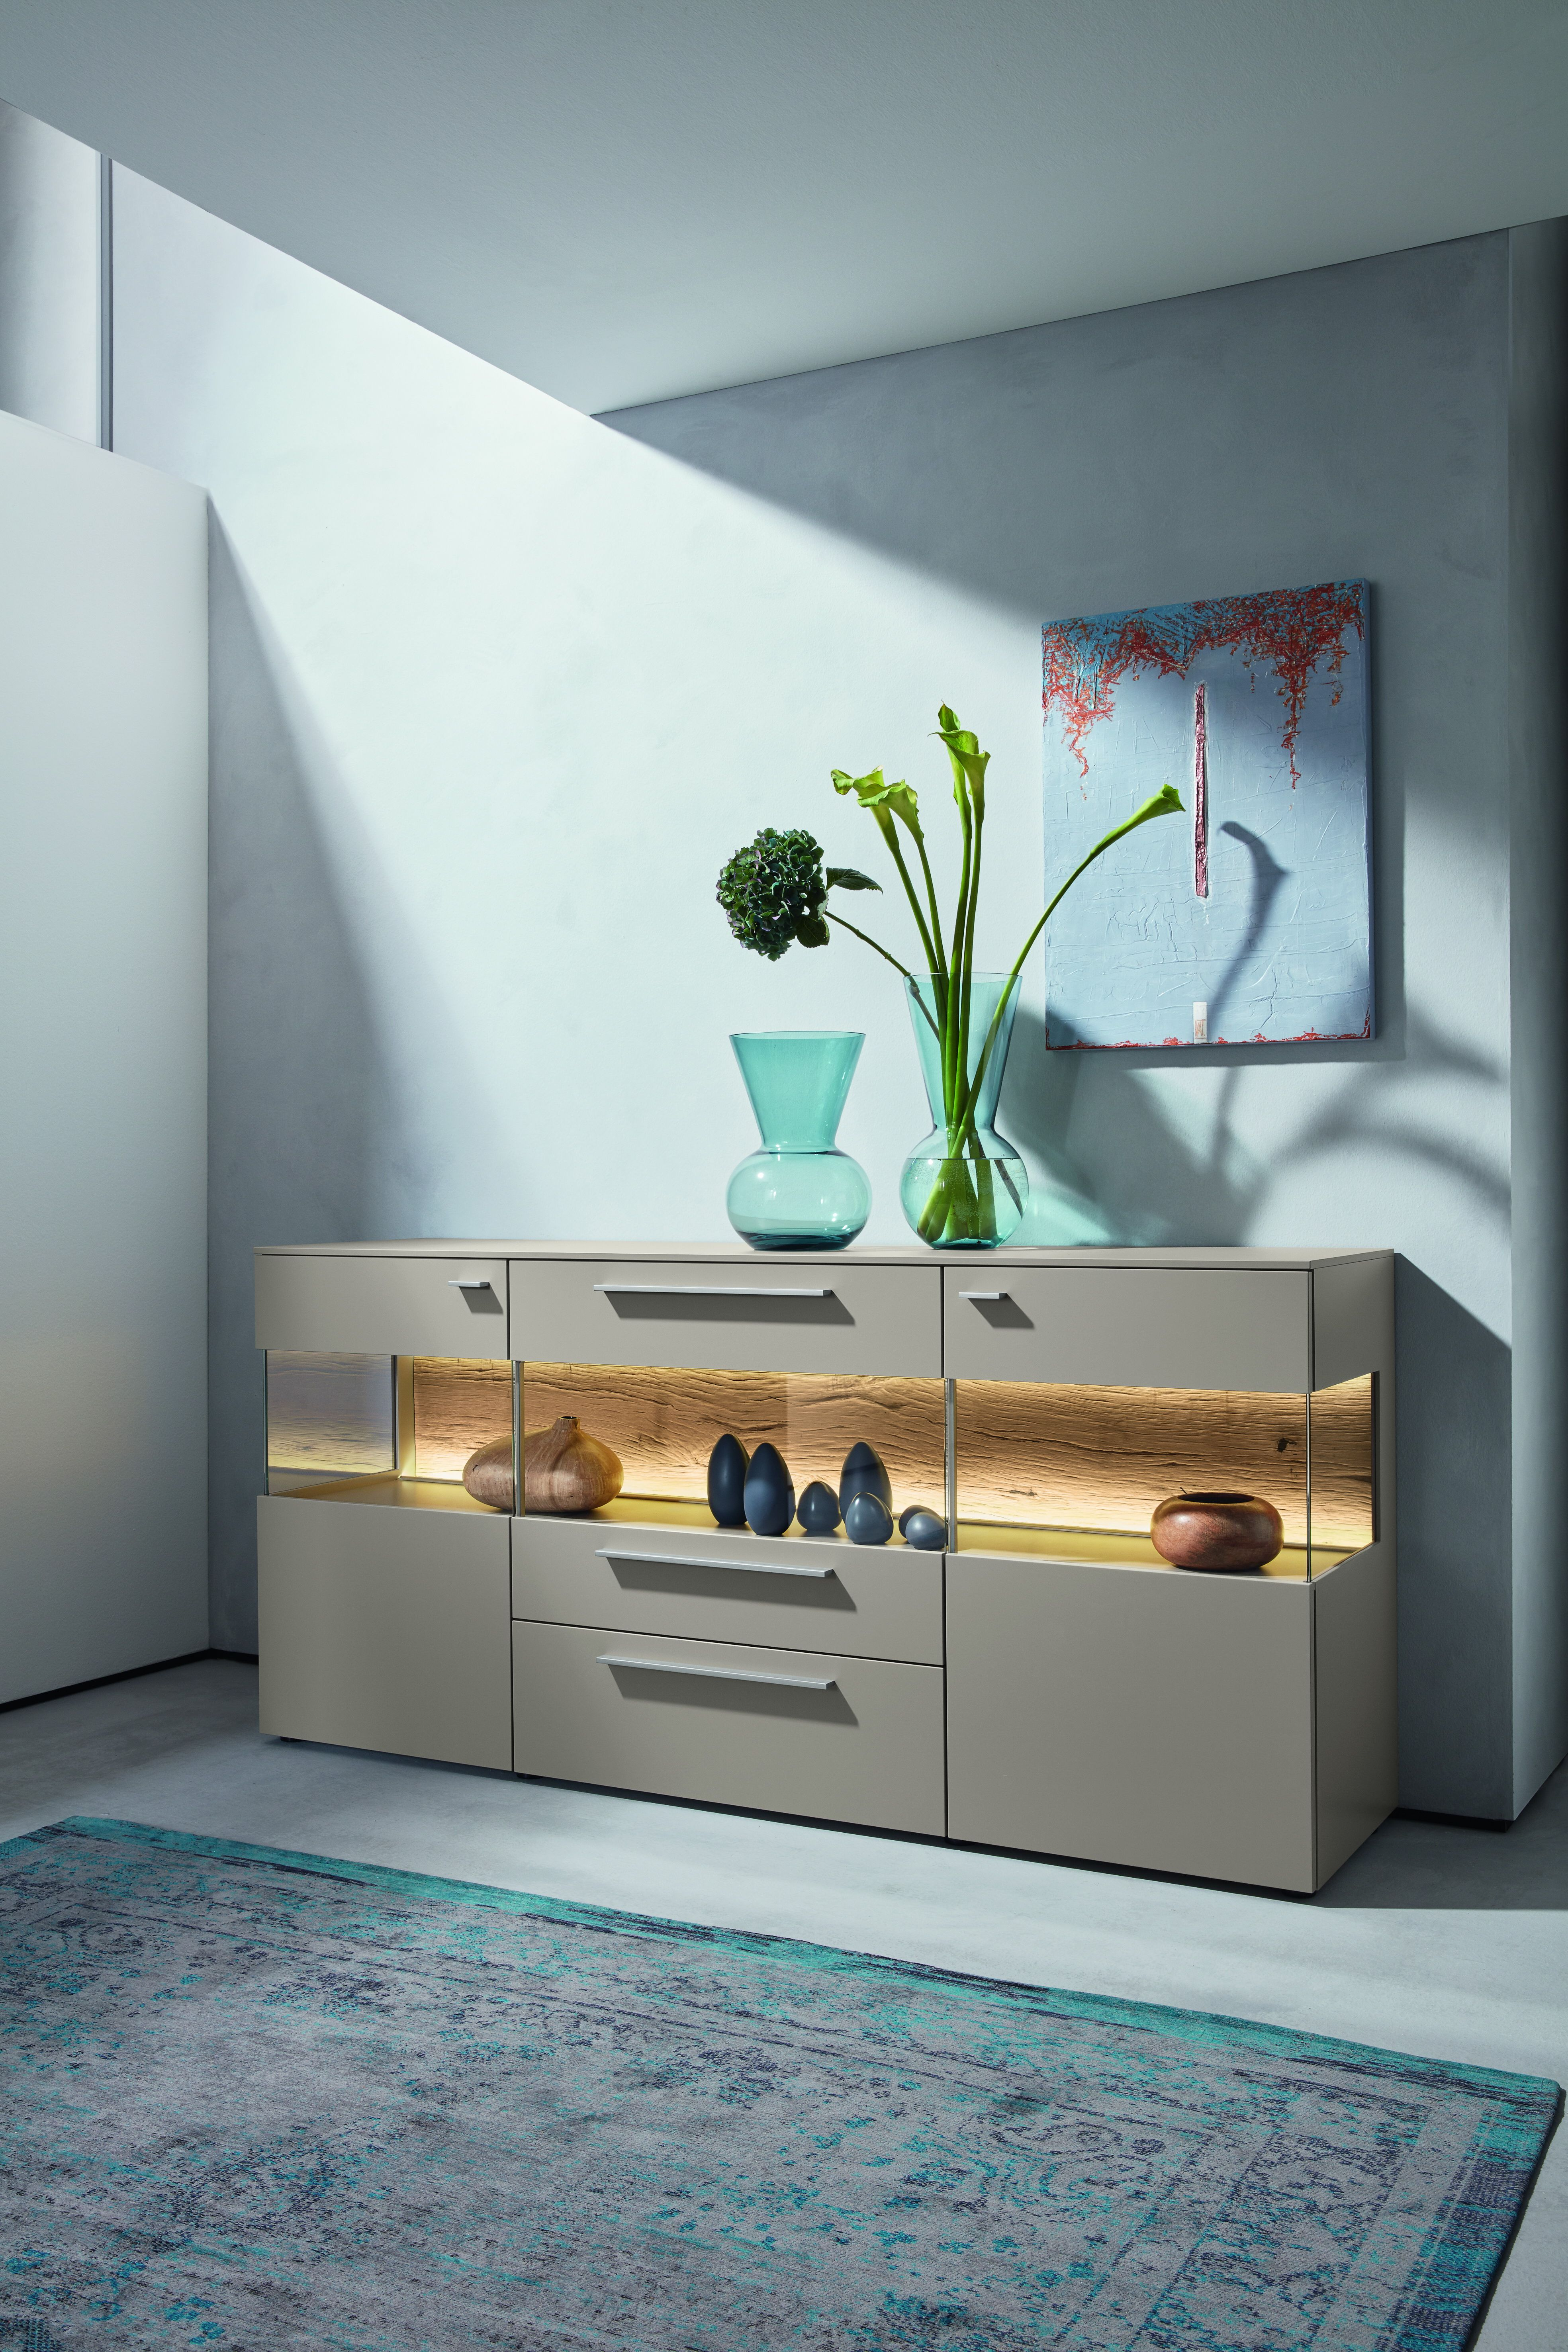 möbel #madeingermany #furniture #gwinner #wohndesign #design